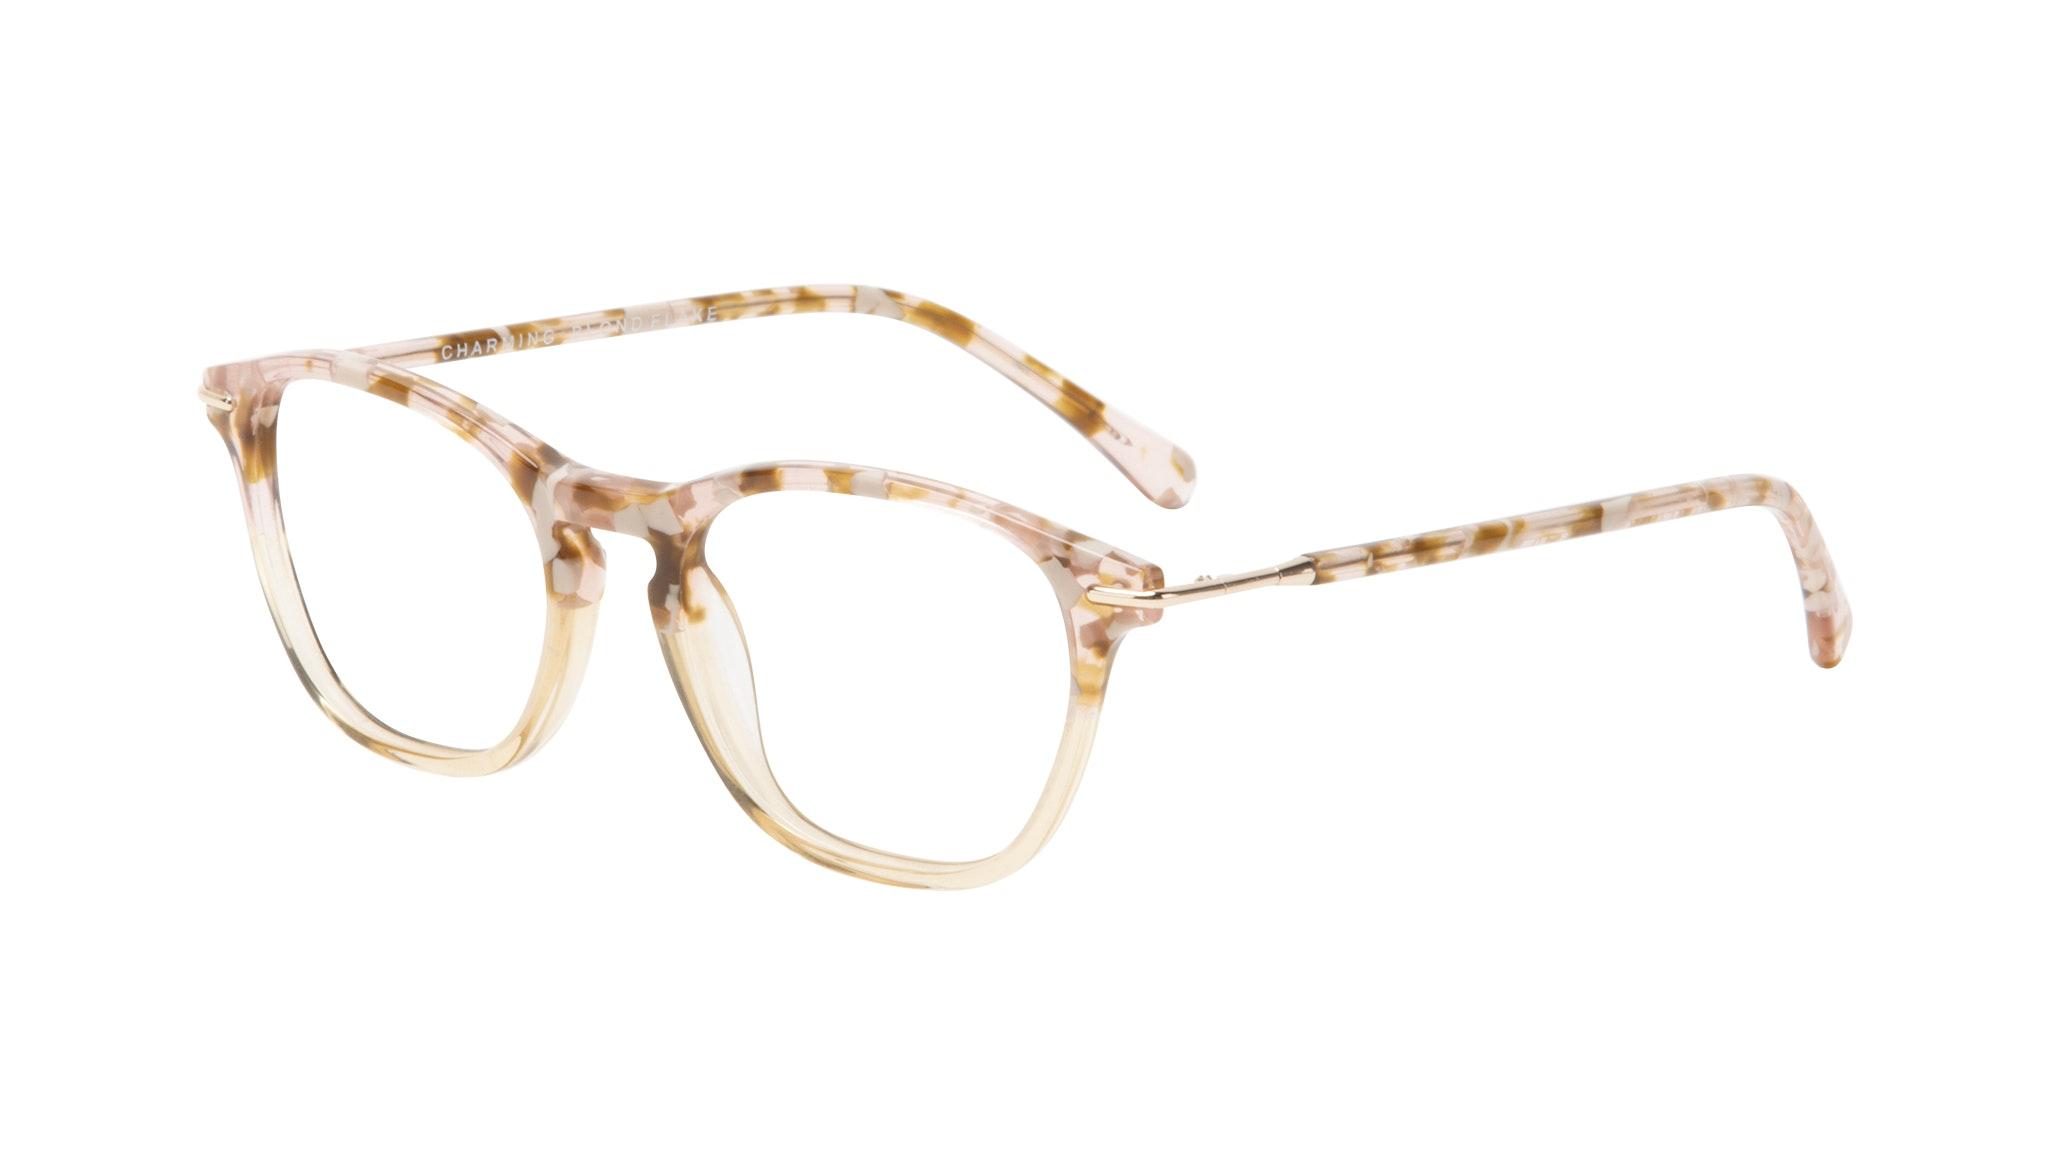 Affordable Fashion Glasses Square Eyeglasses Women Charming Blond Flake Tilt